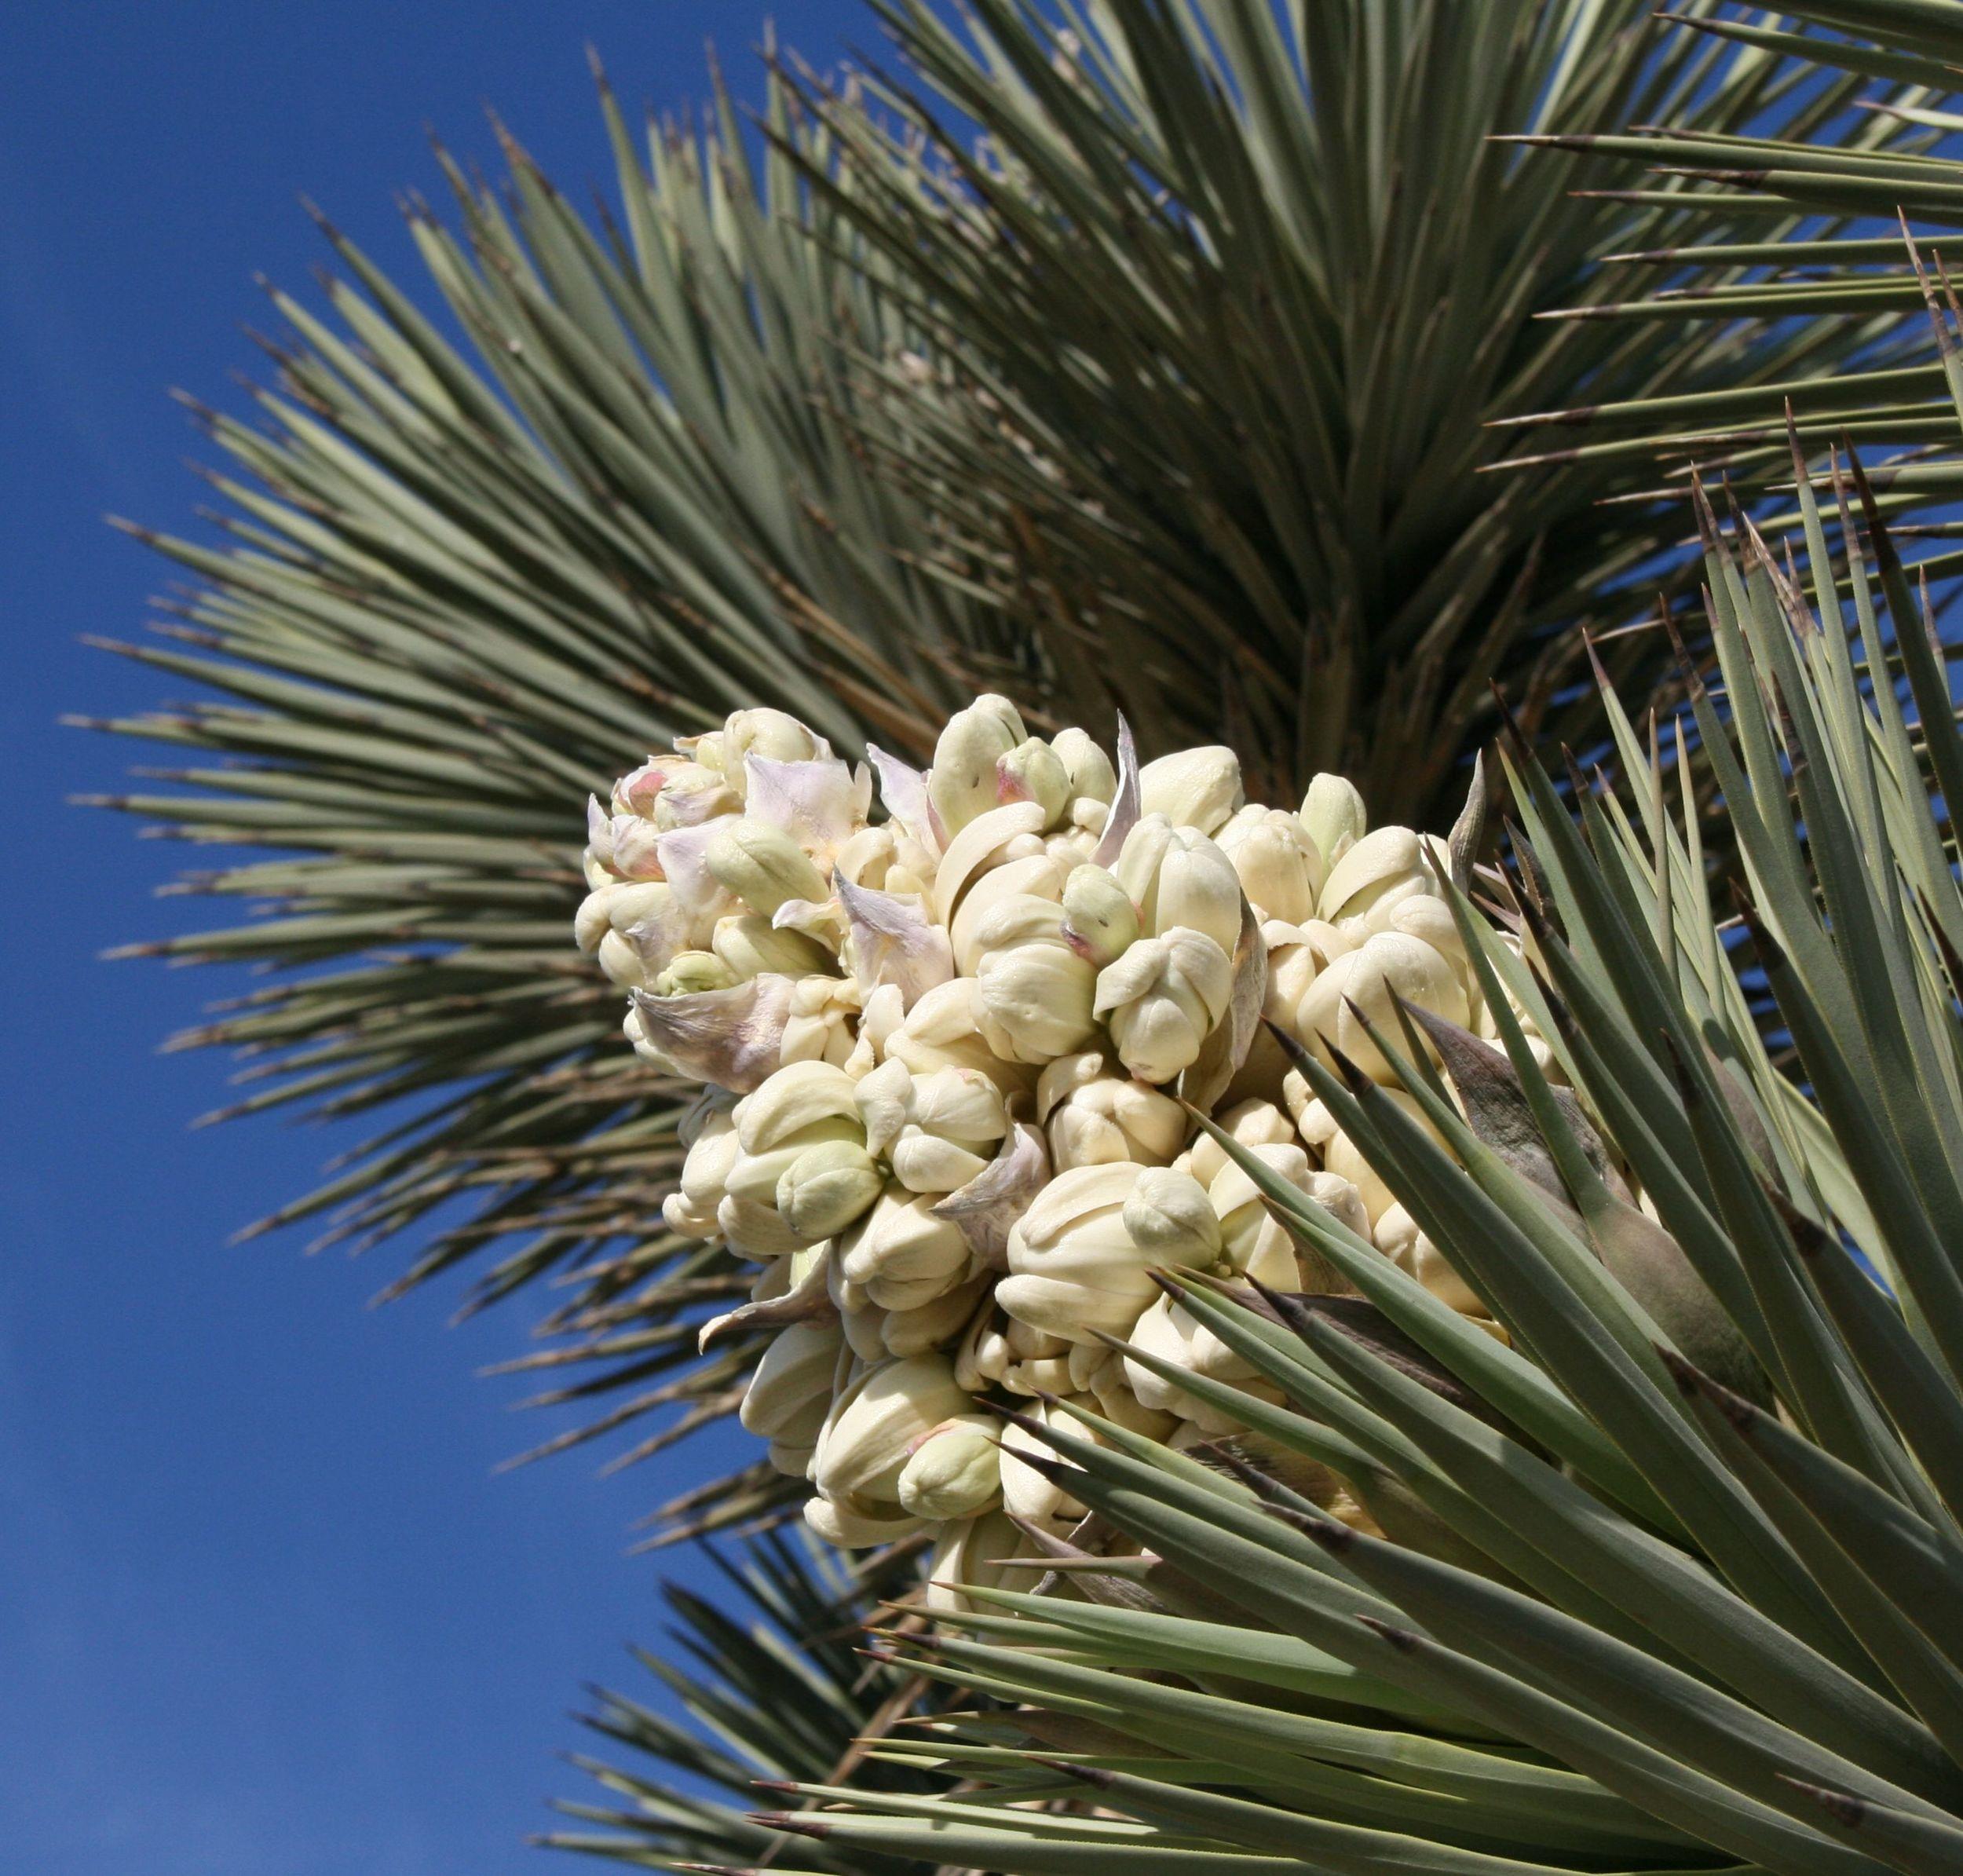 (Takwish)   Joshua Tree ( Yucca brevifolia ) panicle (inflorescence). Mojave Desert near Kramer Junction, California